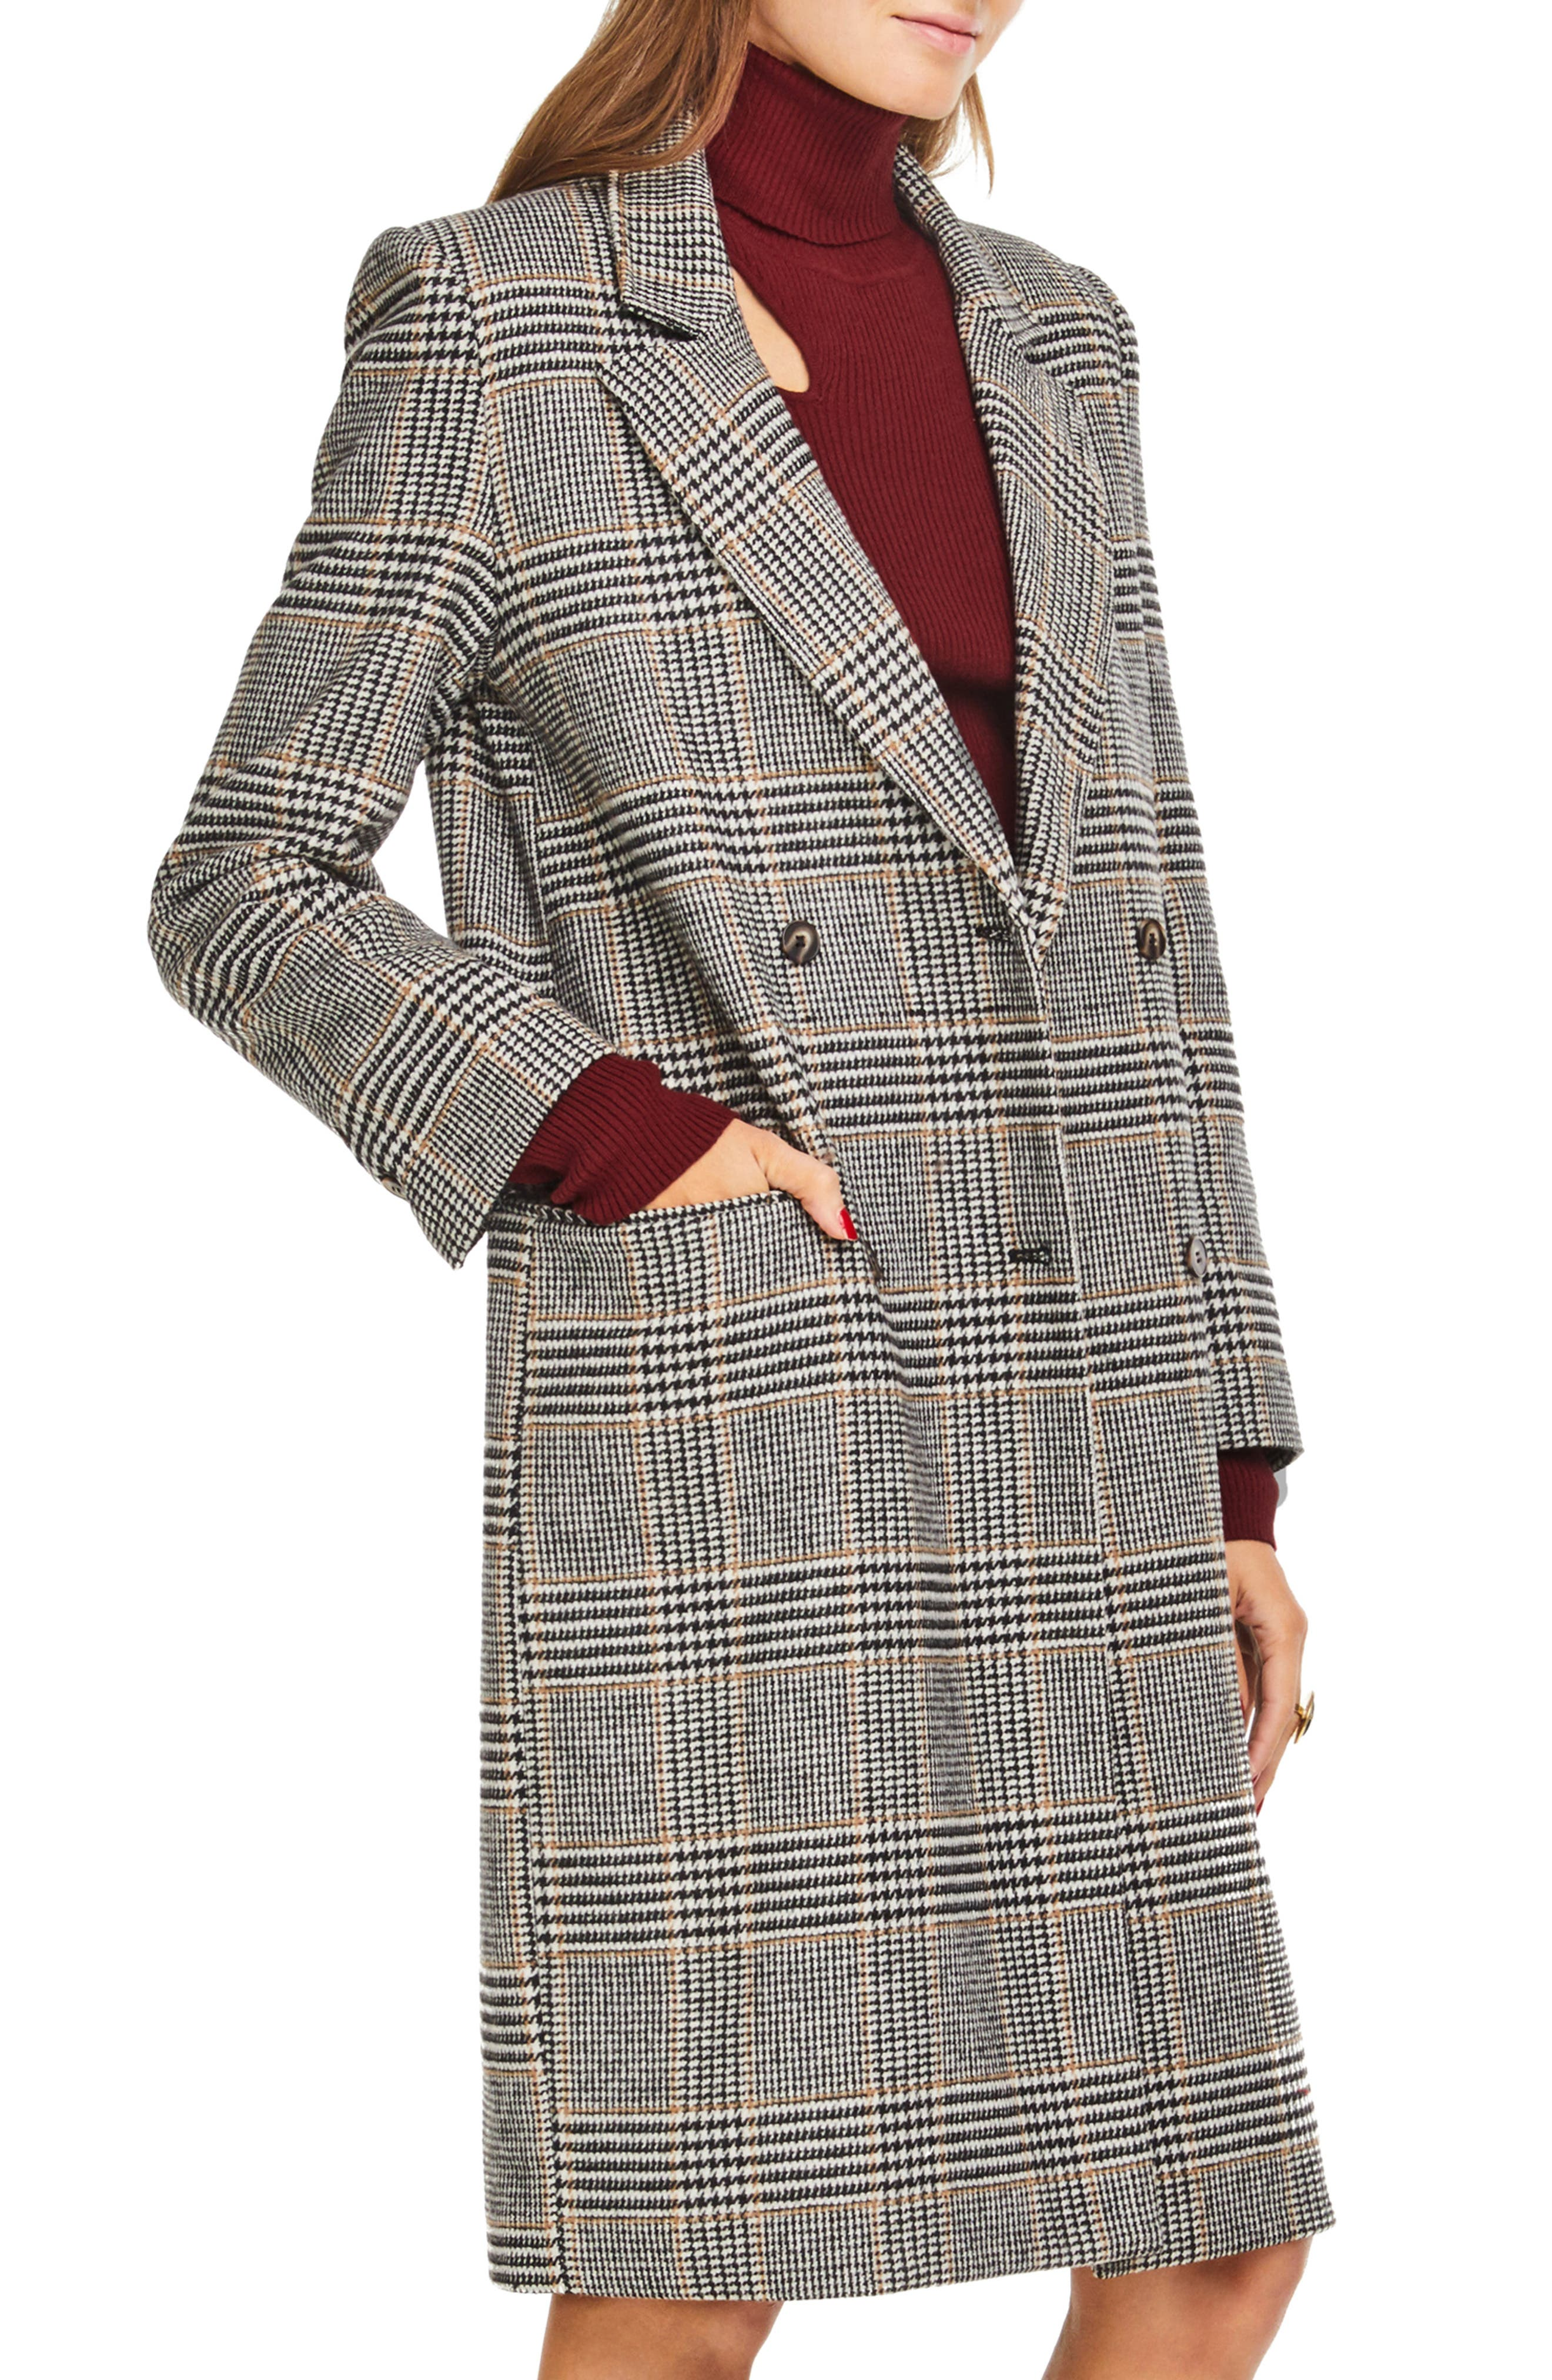 Kensington Plaid Long Coat,                             Alternate thumbnail 3, color,                             BLACK/ MUSTARD PLAID